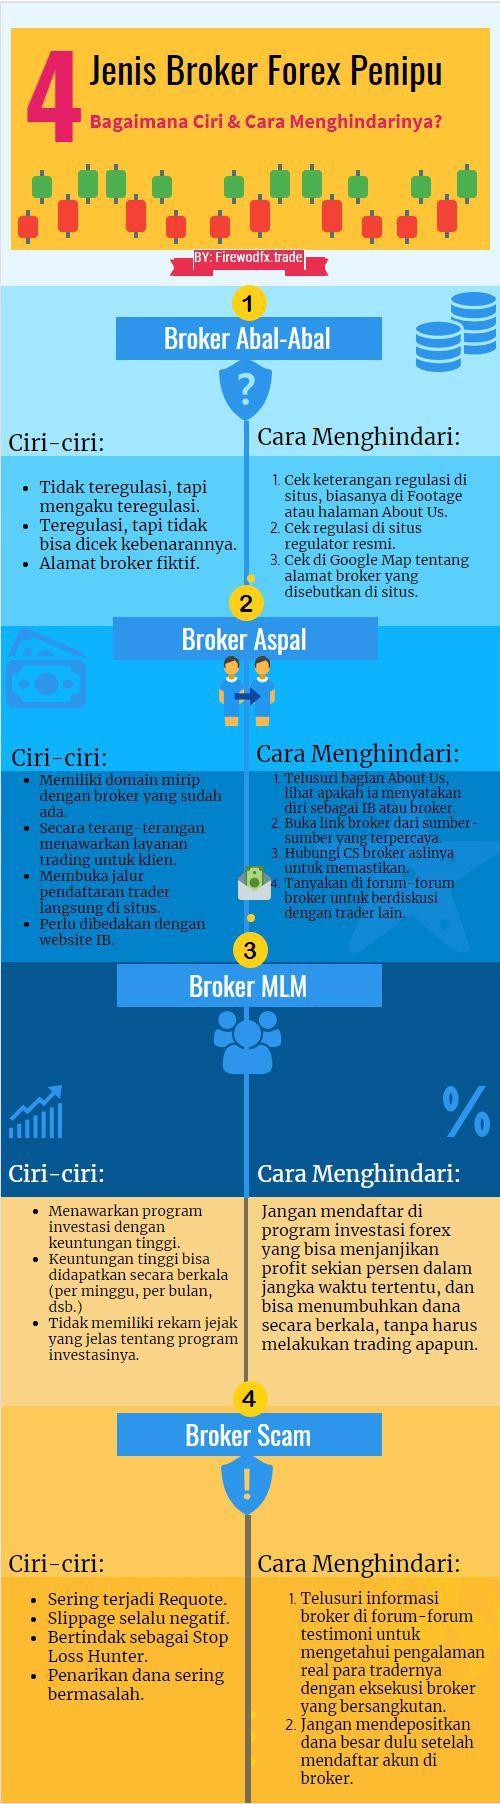 Jenis broker forex